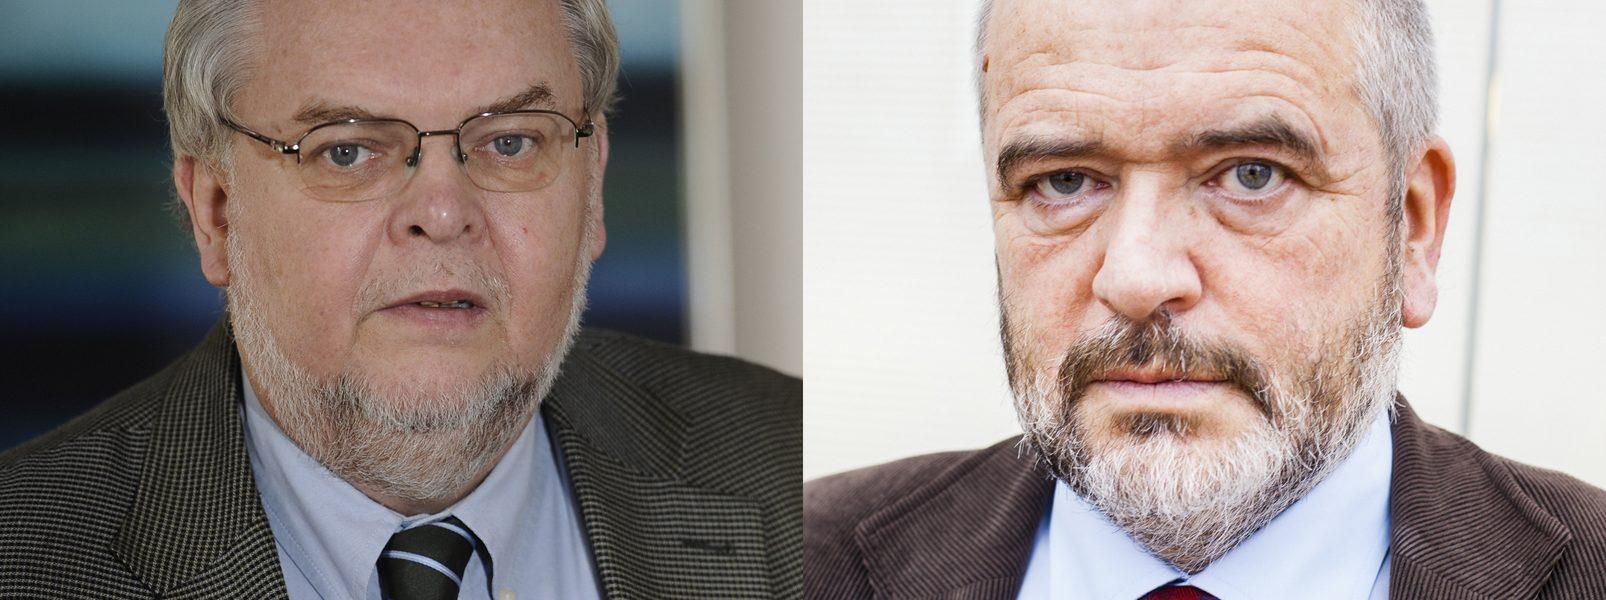 Prof. Andrzej Rychard & prof. Dariusz Filar